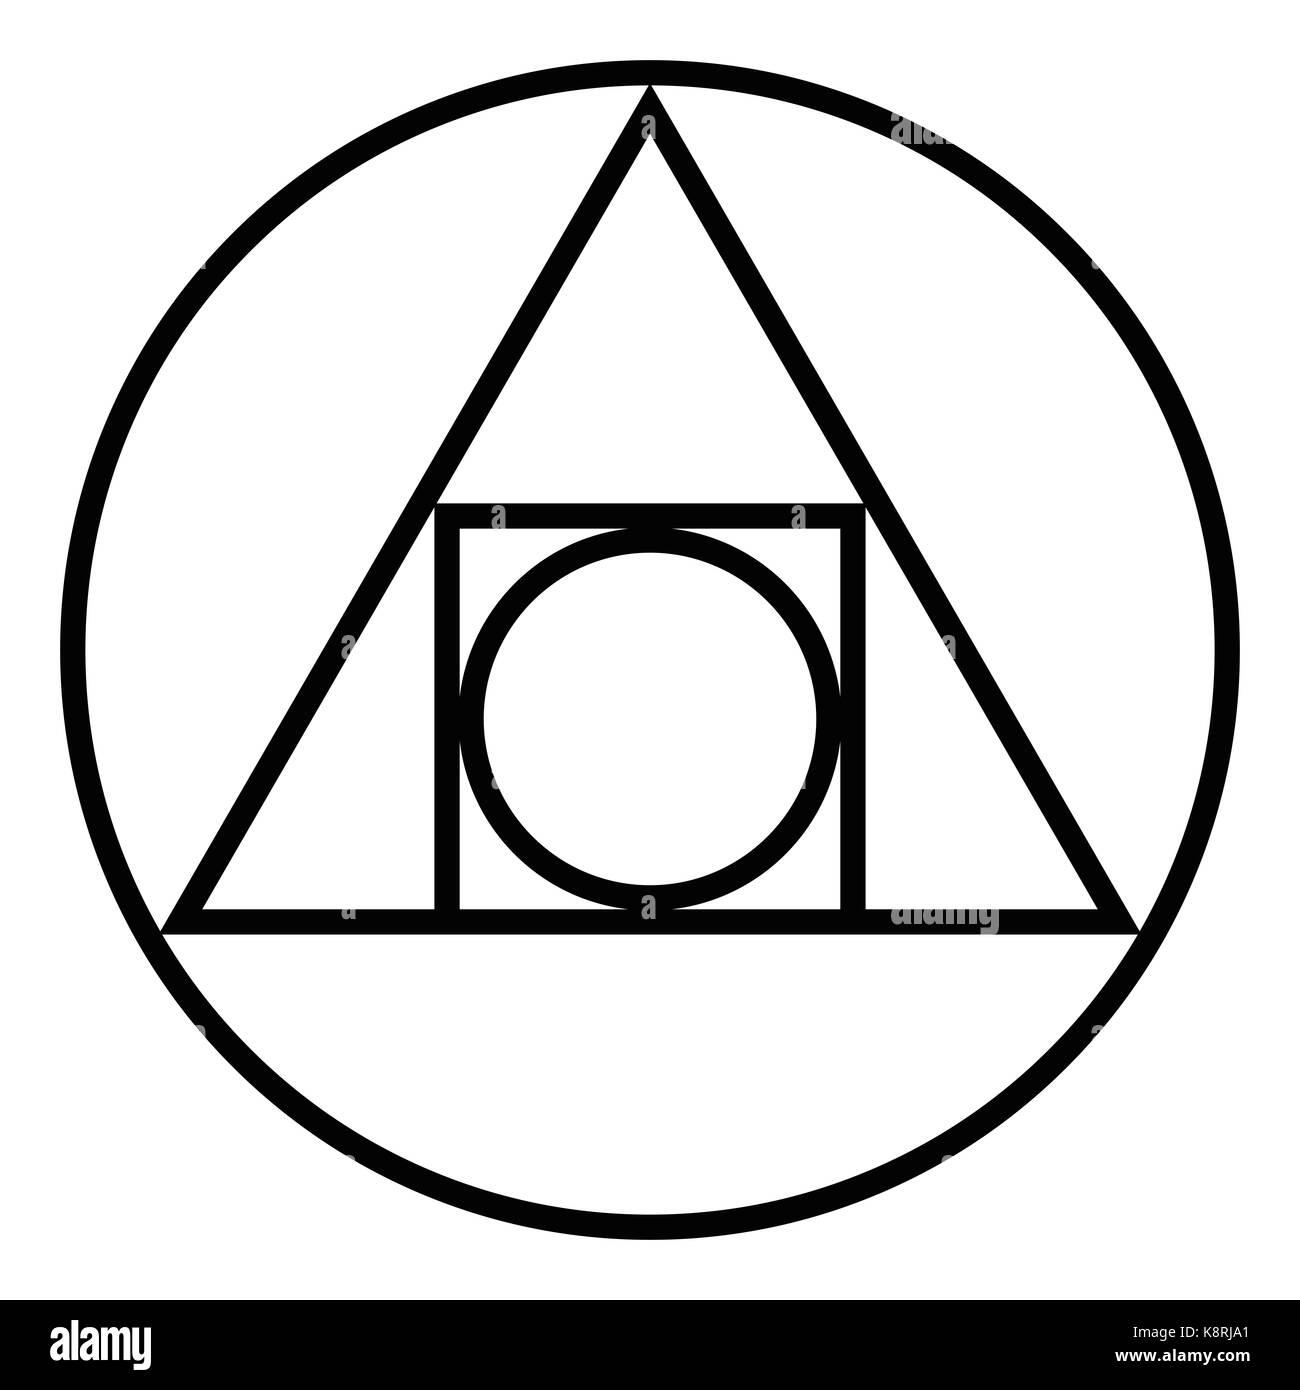 Alchemy Symbol Stockfotos & Alchemy Symbol Bilder - Alamy